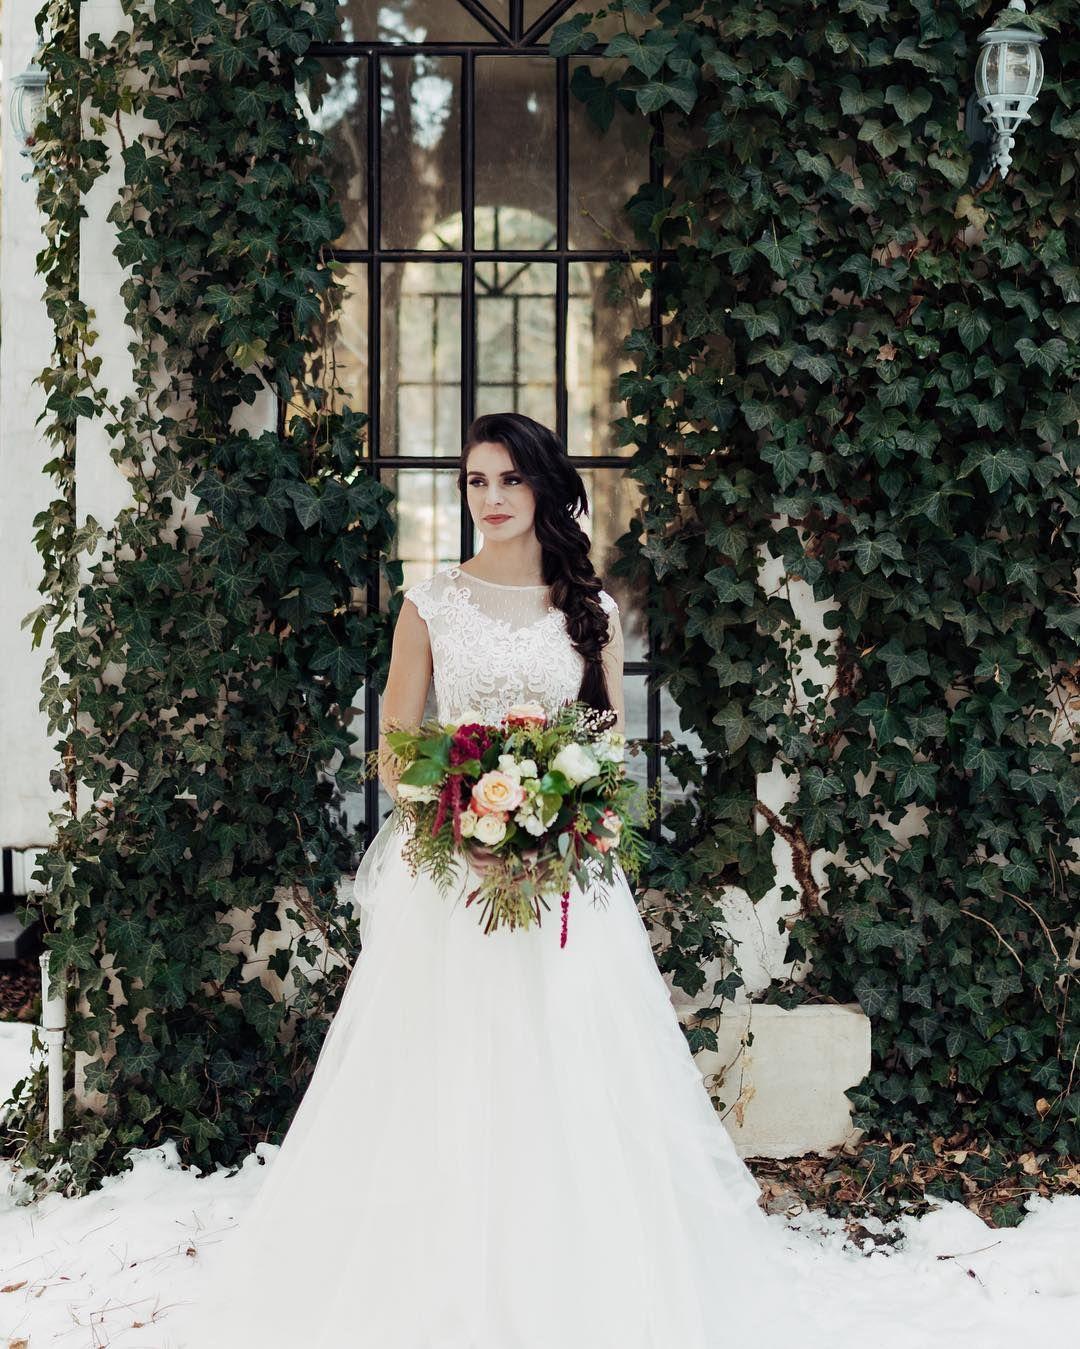 Wedding Dress With Sleeves Utah Wedding Dress Winter Wedding Dress Wedding Dress Champagne [ 1349 x 1080 Pixel ]